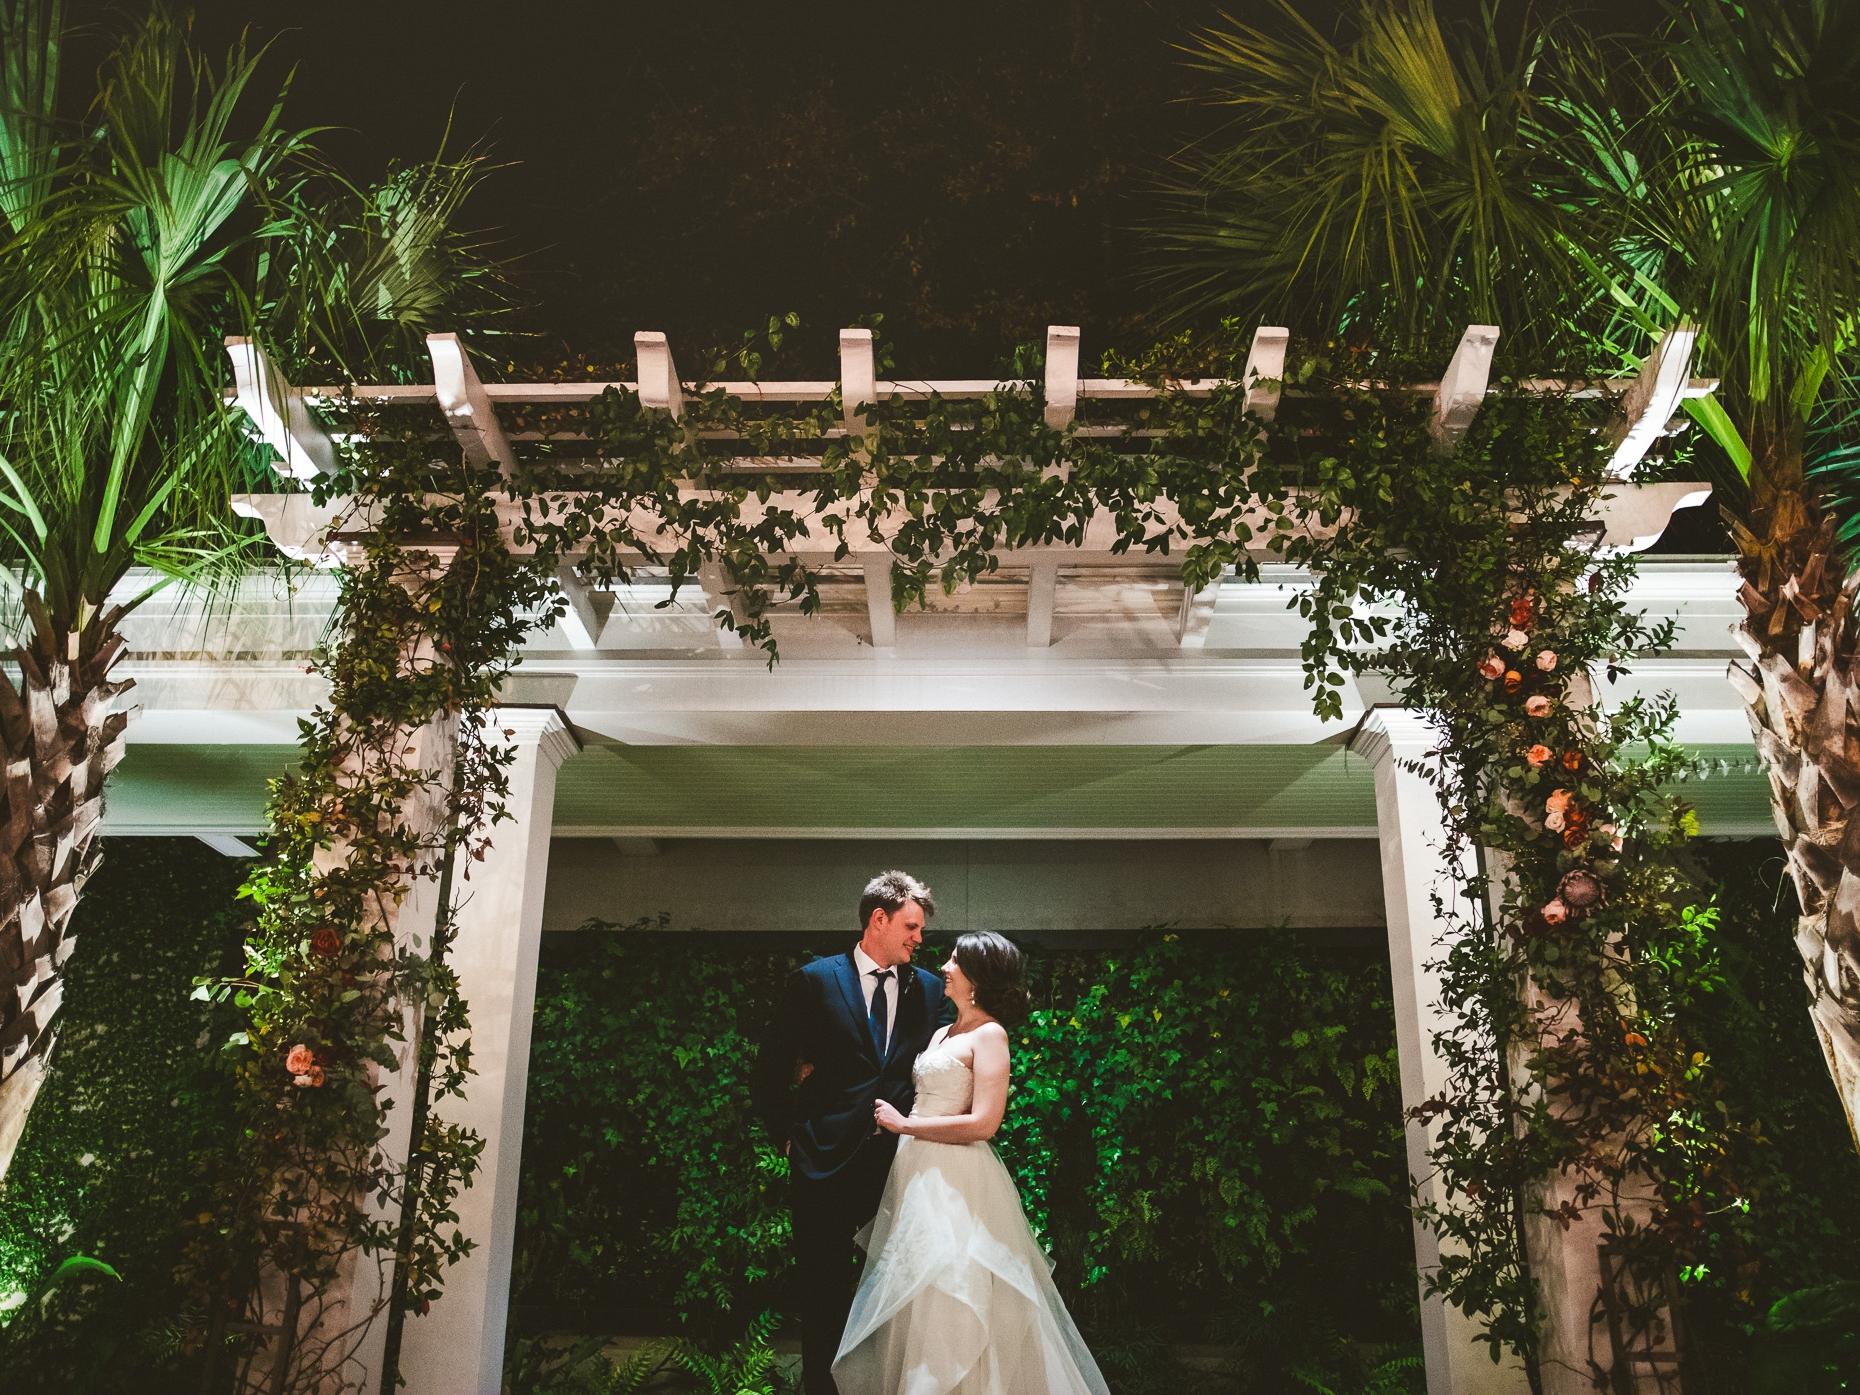 Cristina & Ryan // Wedding - Cannon Green Charleston, SC 04.12.2018